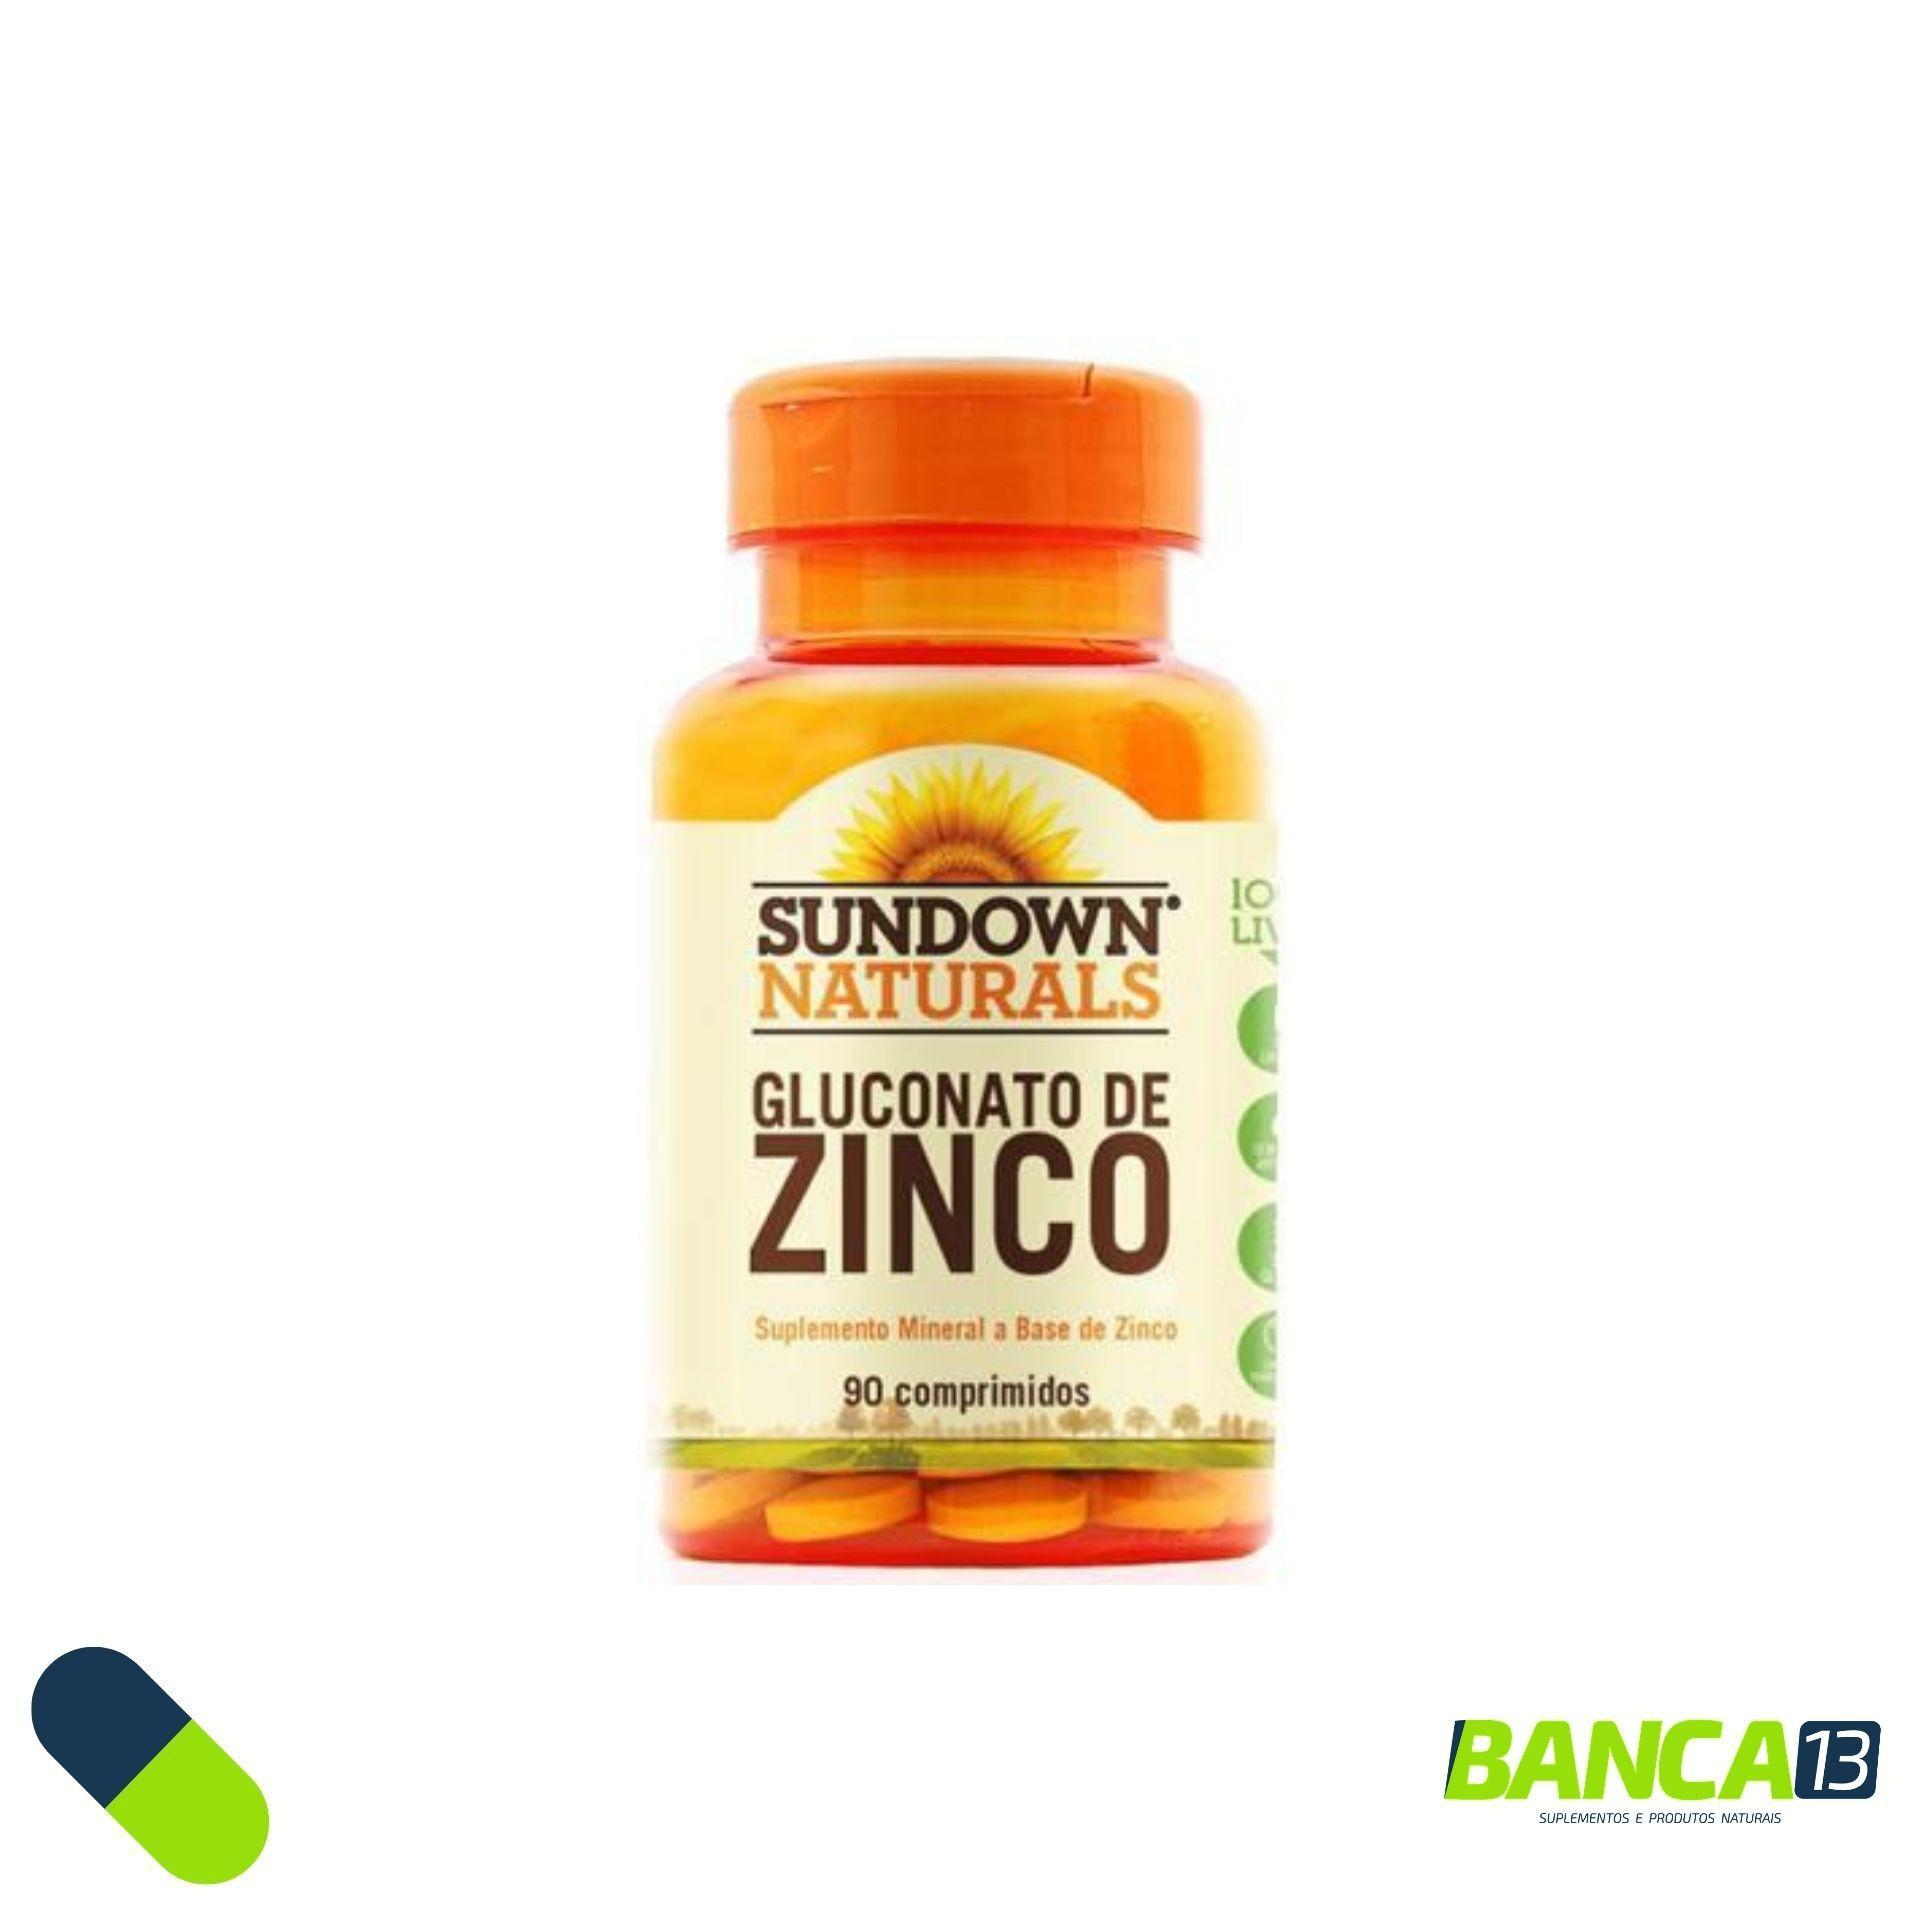 GLUCONATO DE ZINCO 90 COMPRIMIDOS - SUNDOWN NATURALS